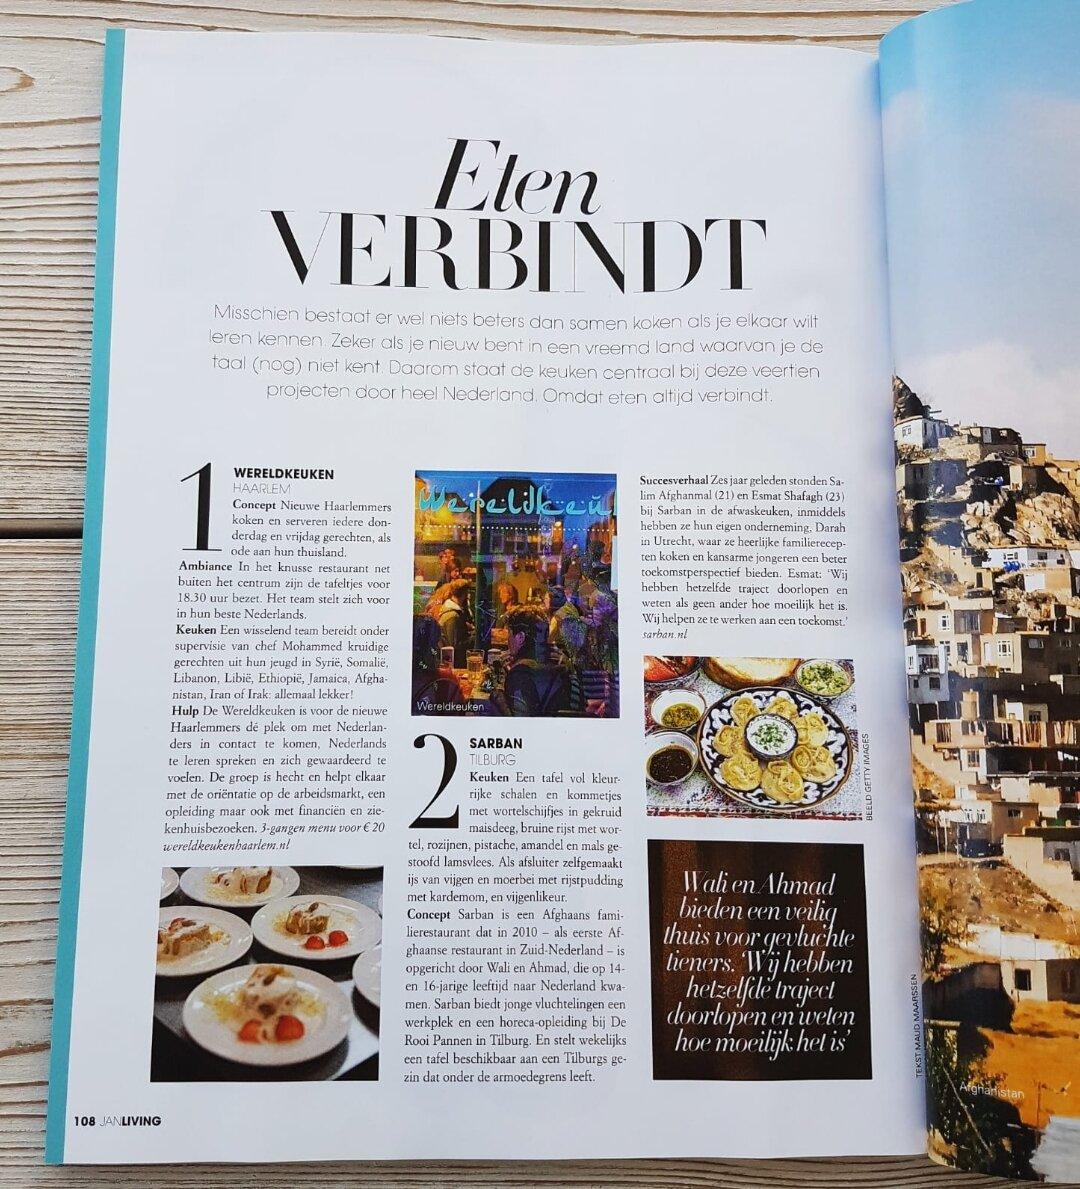 Artikel Eten Verbindt in Jan Magazine